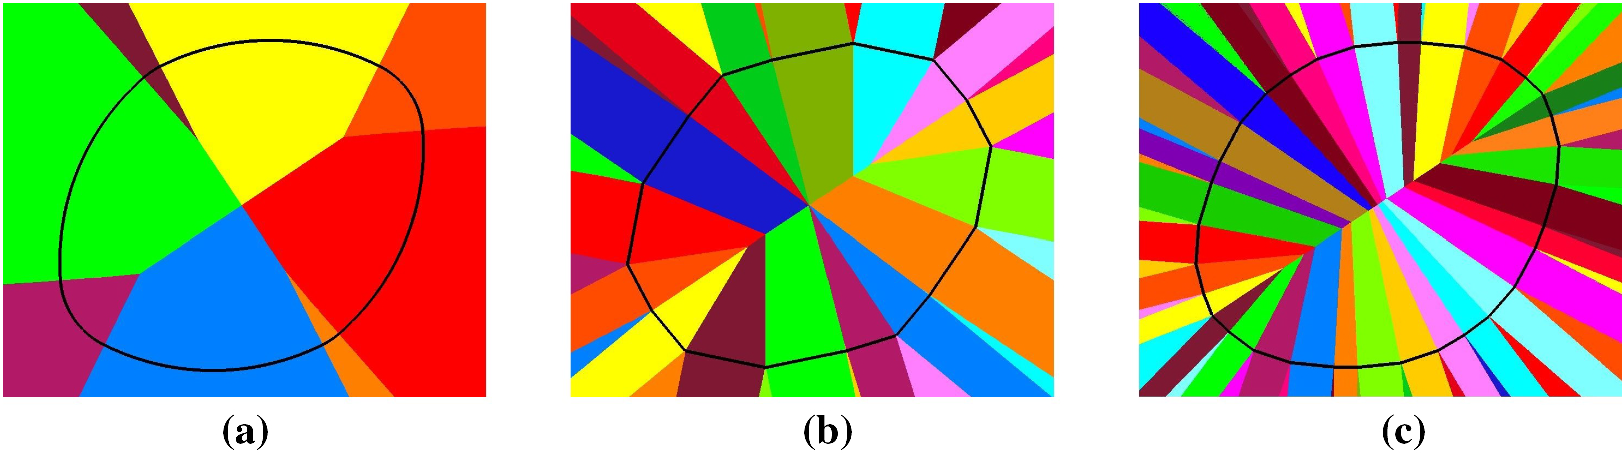 Minkowski sum computation for planar freeform geometric